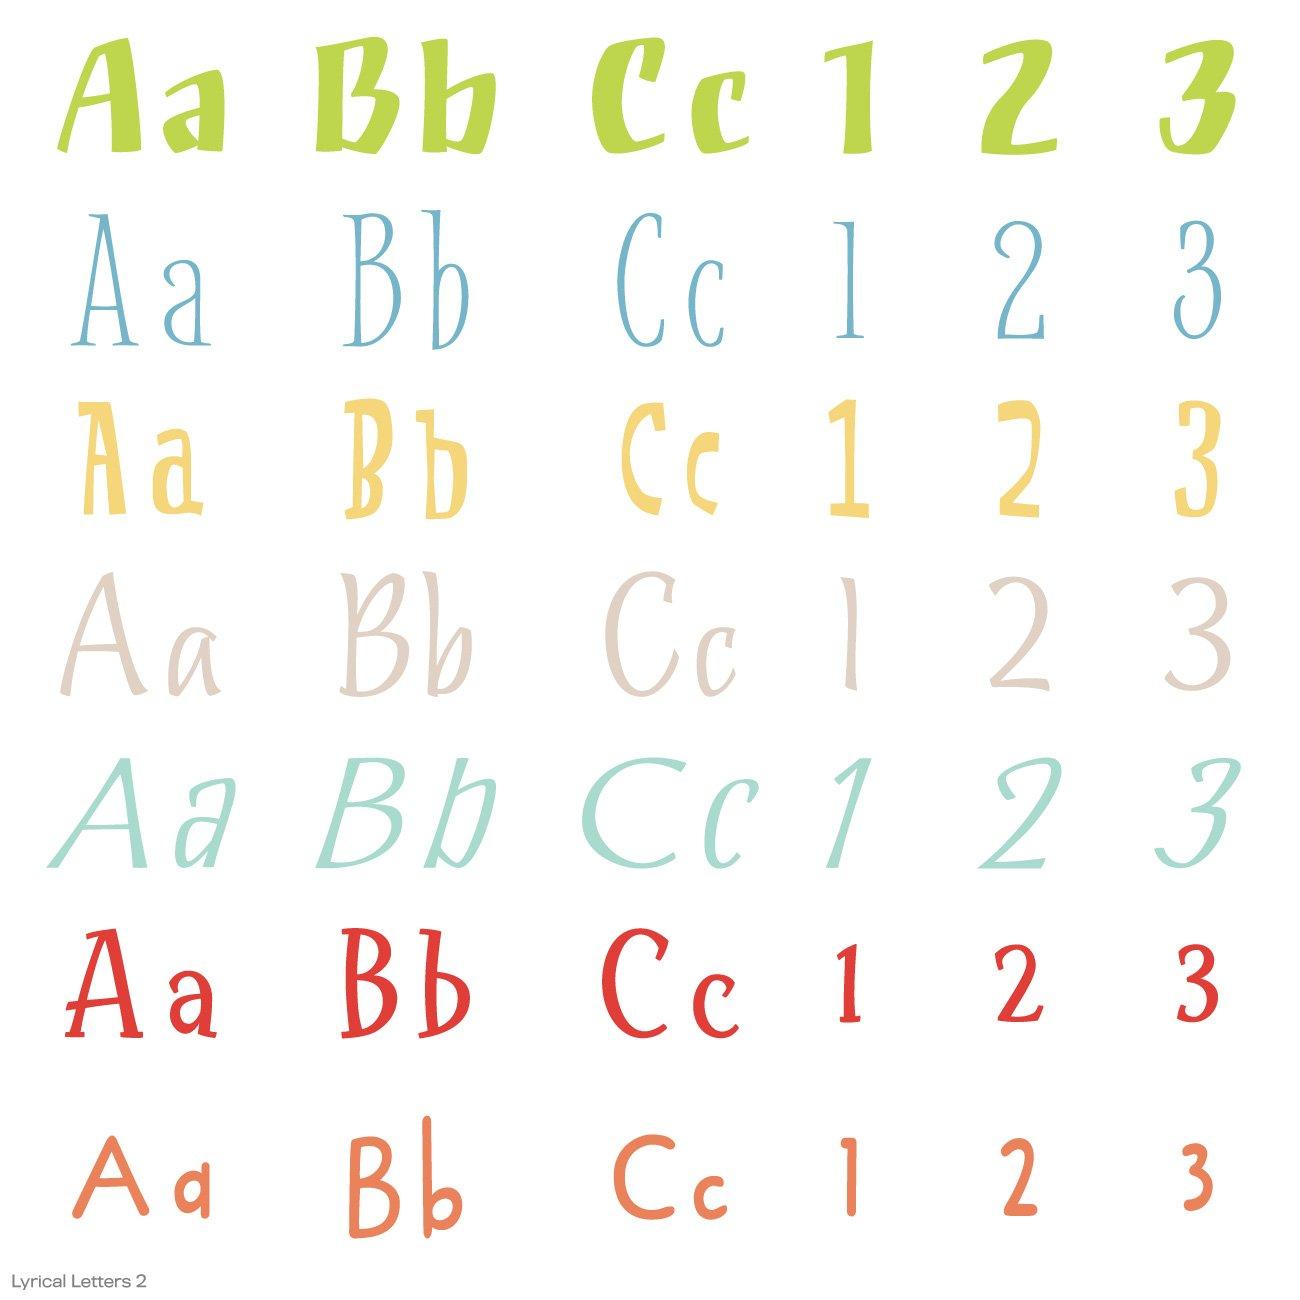 Cricut Lyrical Letters 2 Cartridge by Cricut (Image #3)